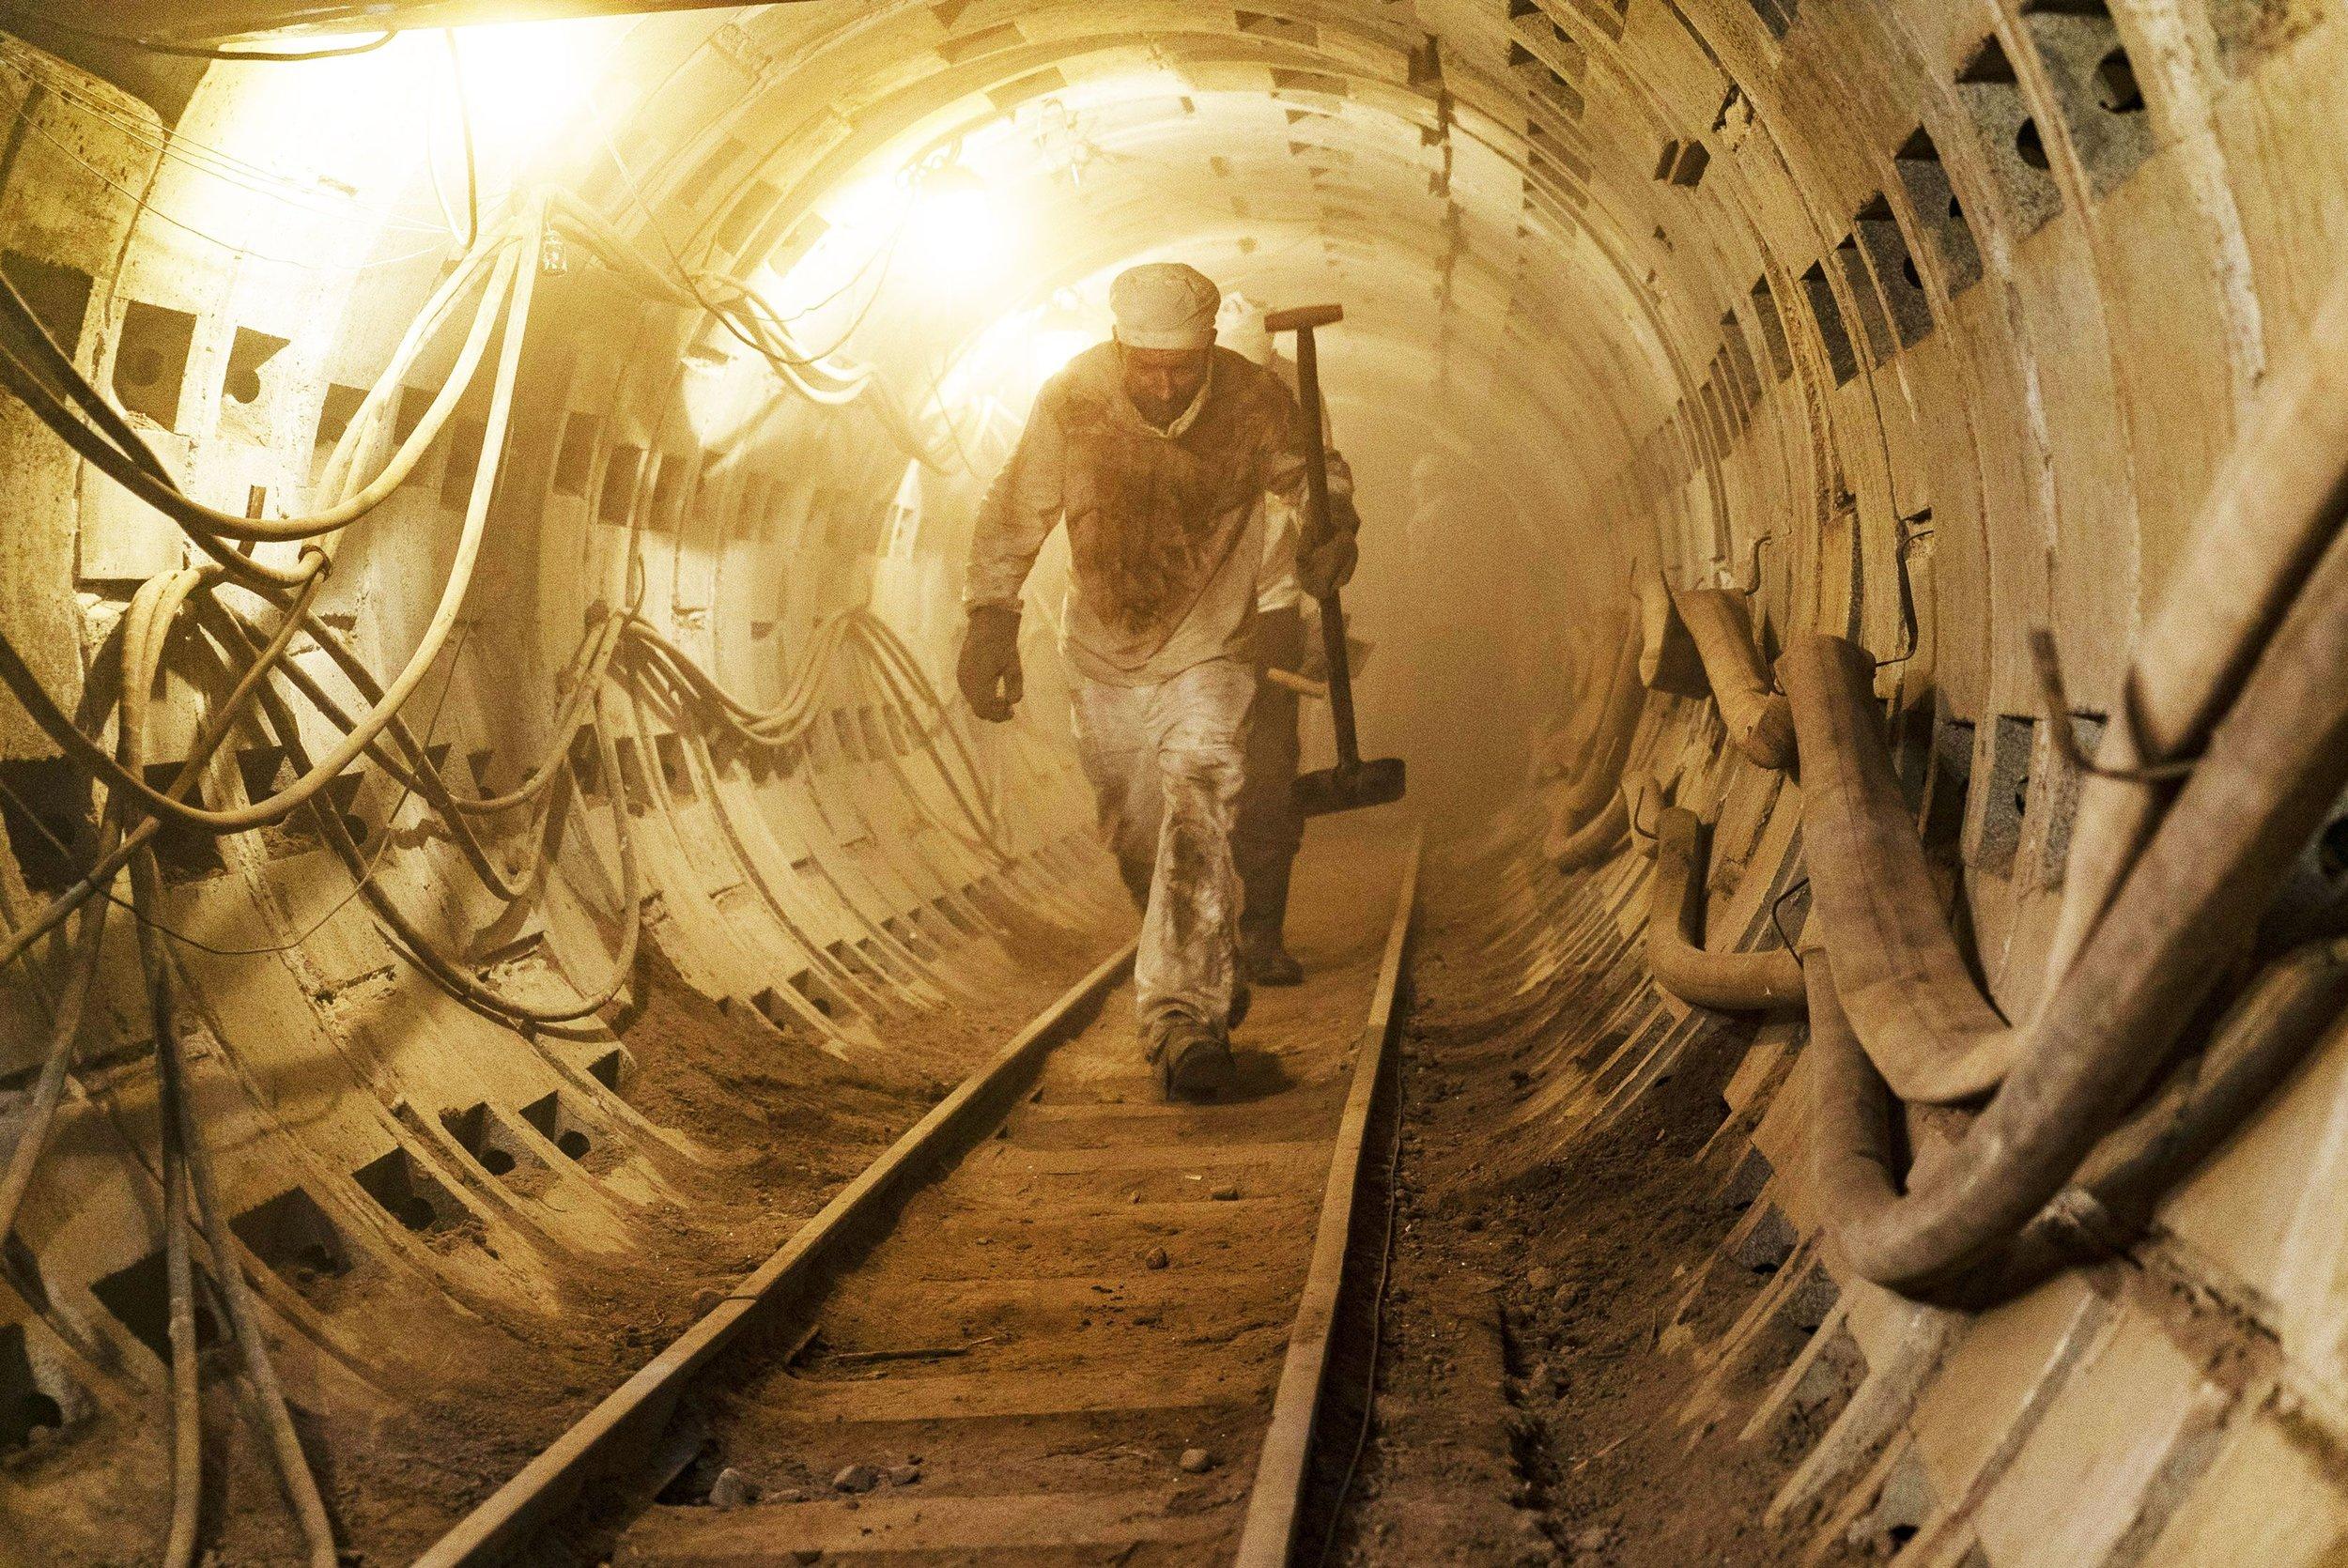 Miners working beneath the reactor.